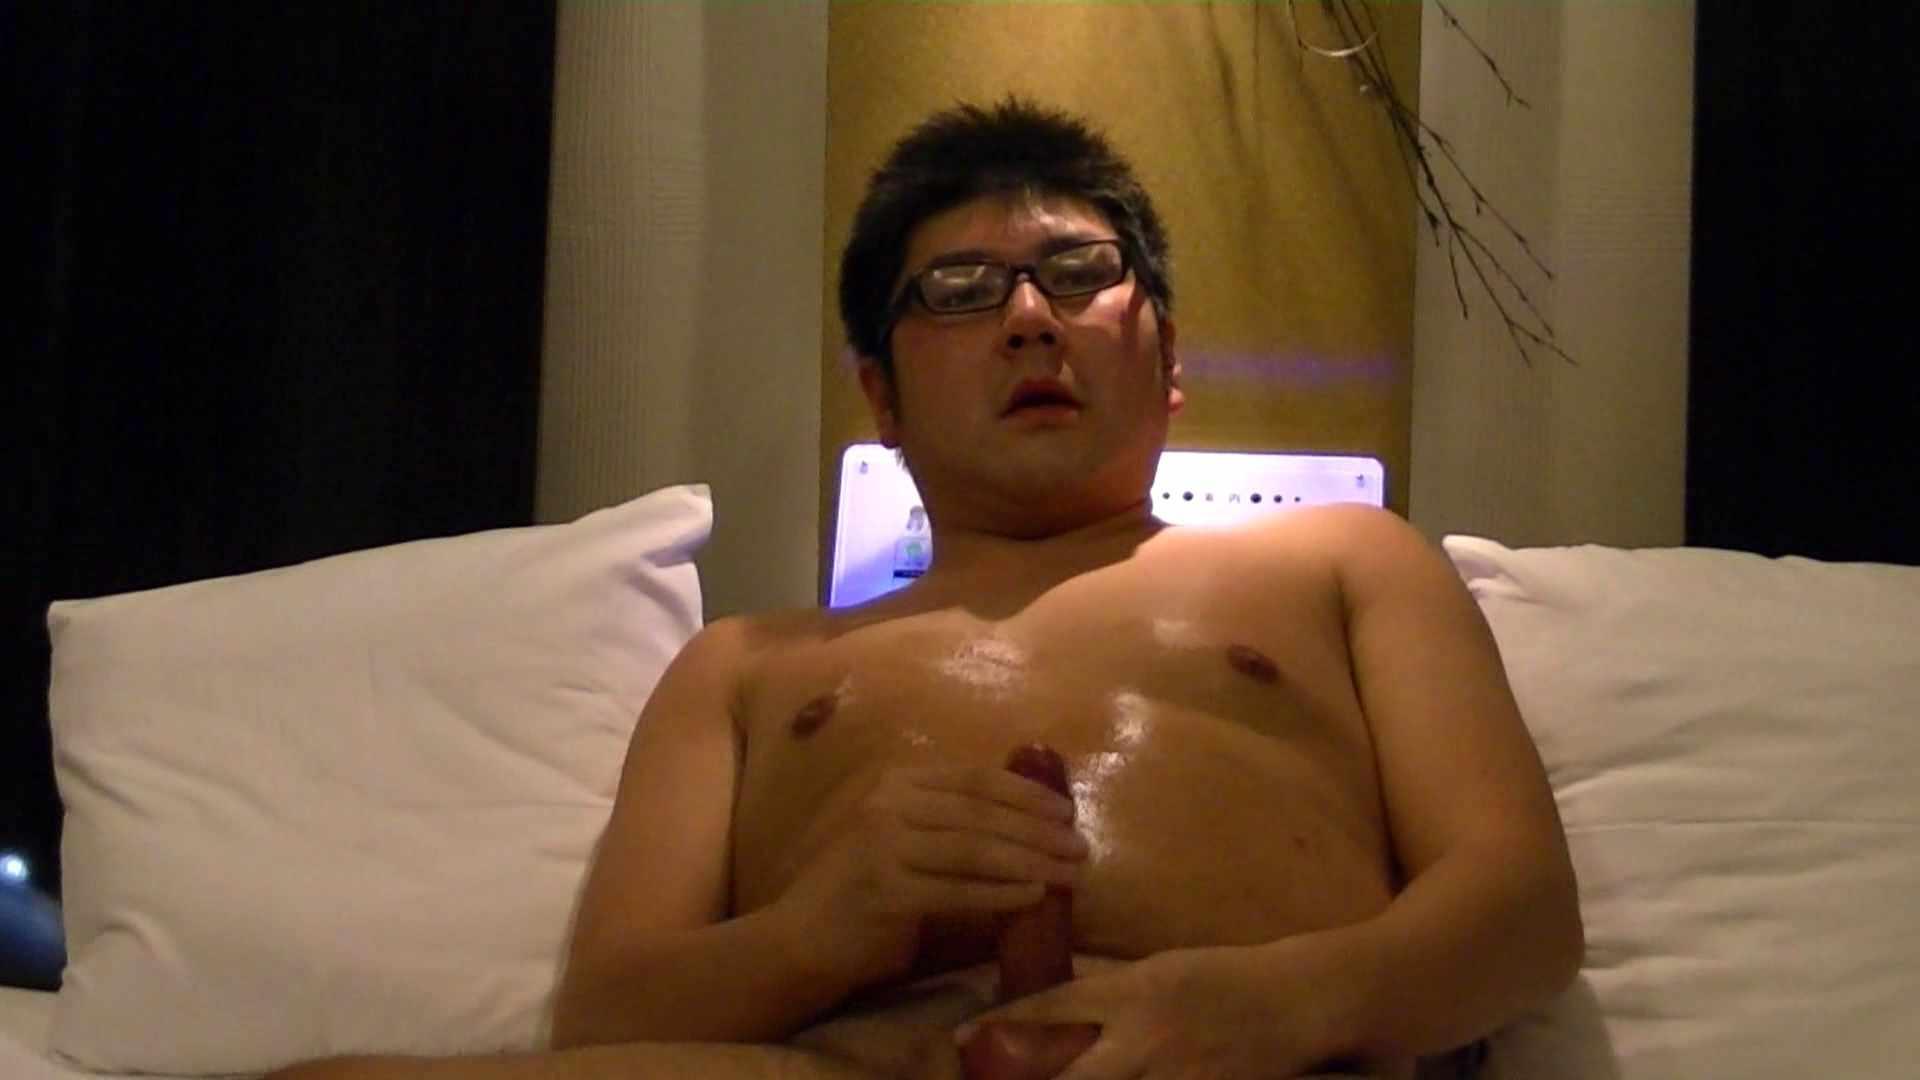 Mr.オナックスさん投稿!HD 貴方のオナニー三万円で撮影させてください。VOL.03 後編 完全無修正でお届け | オナニー特集  83pic 33